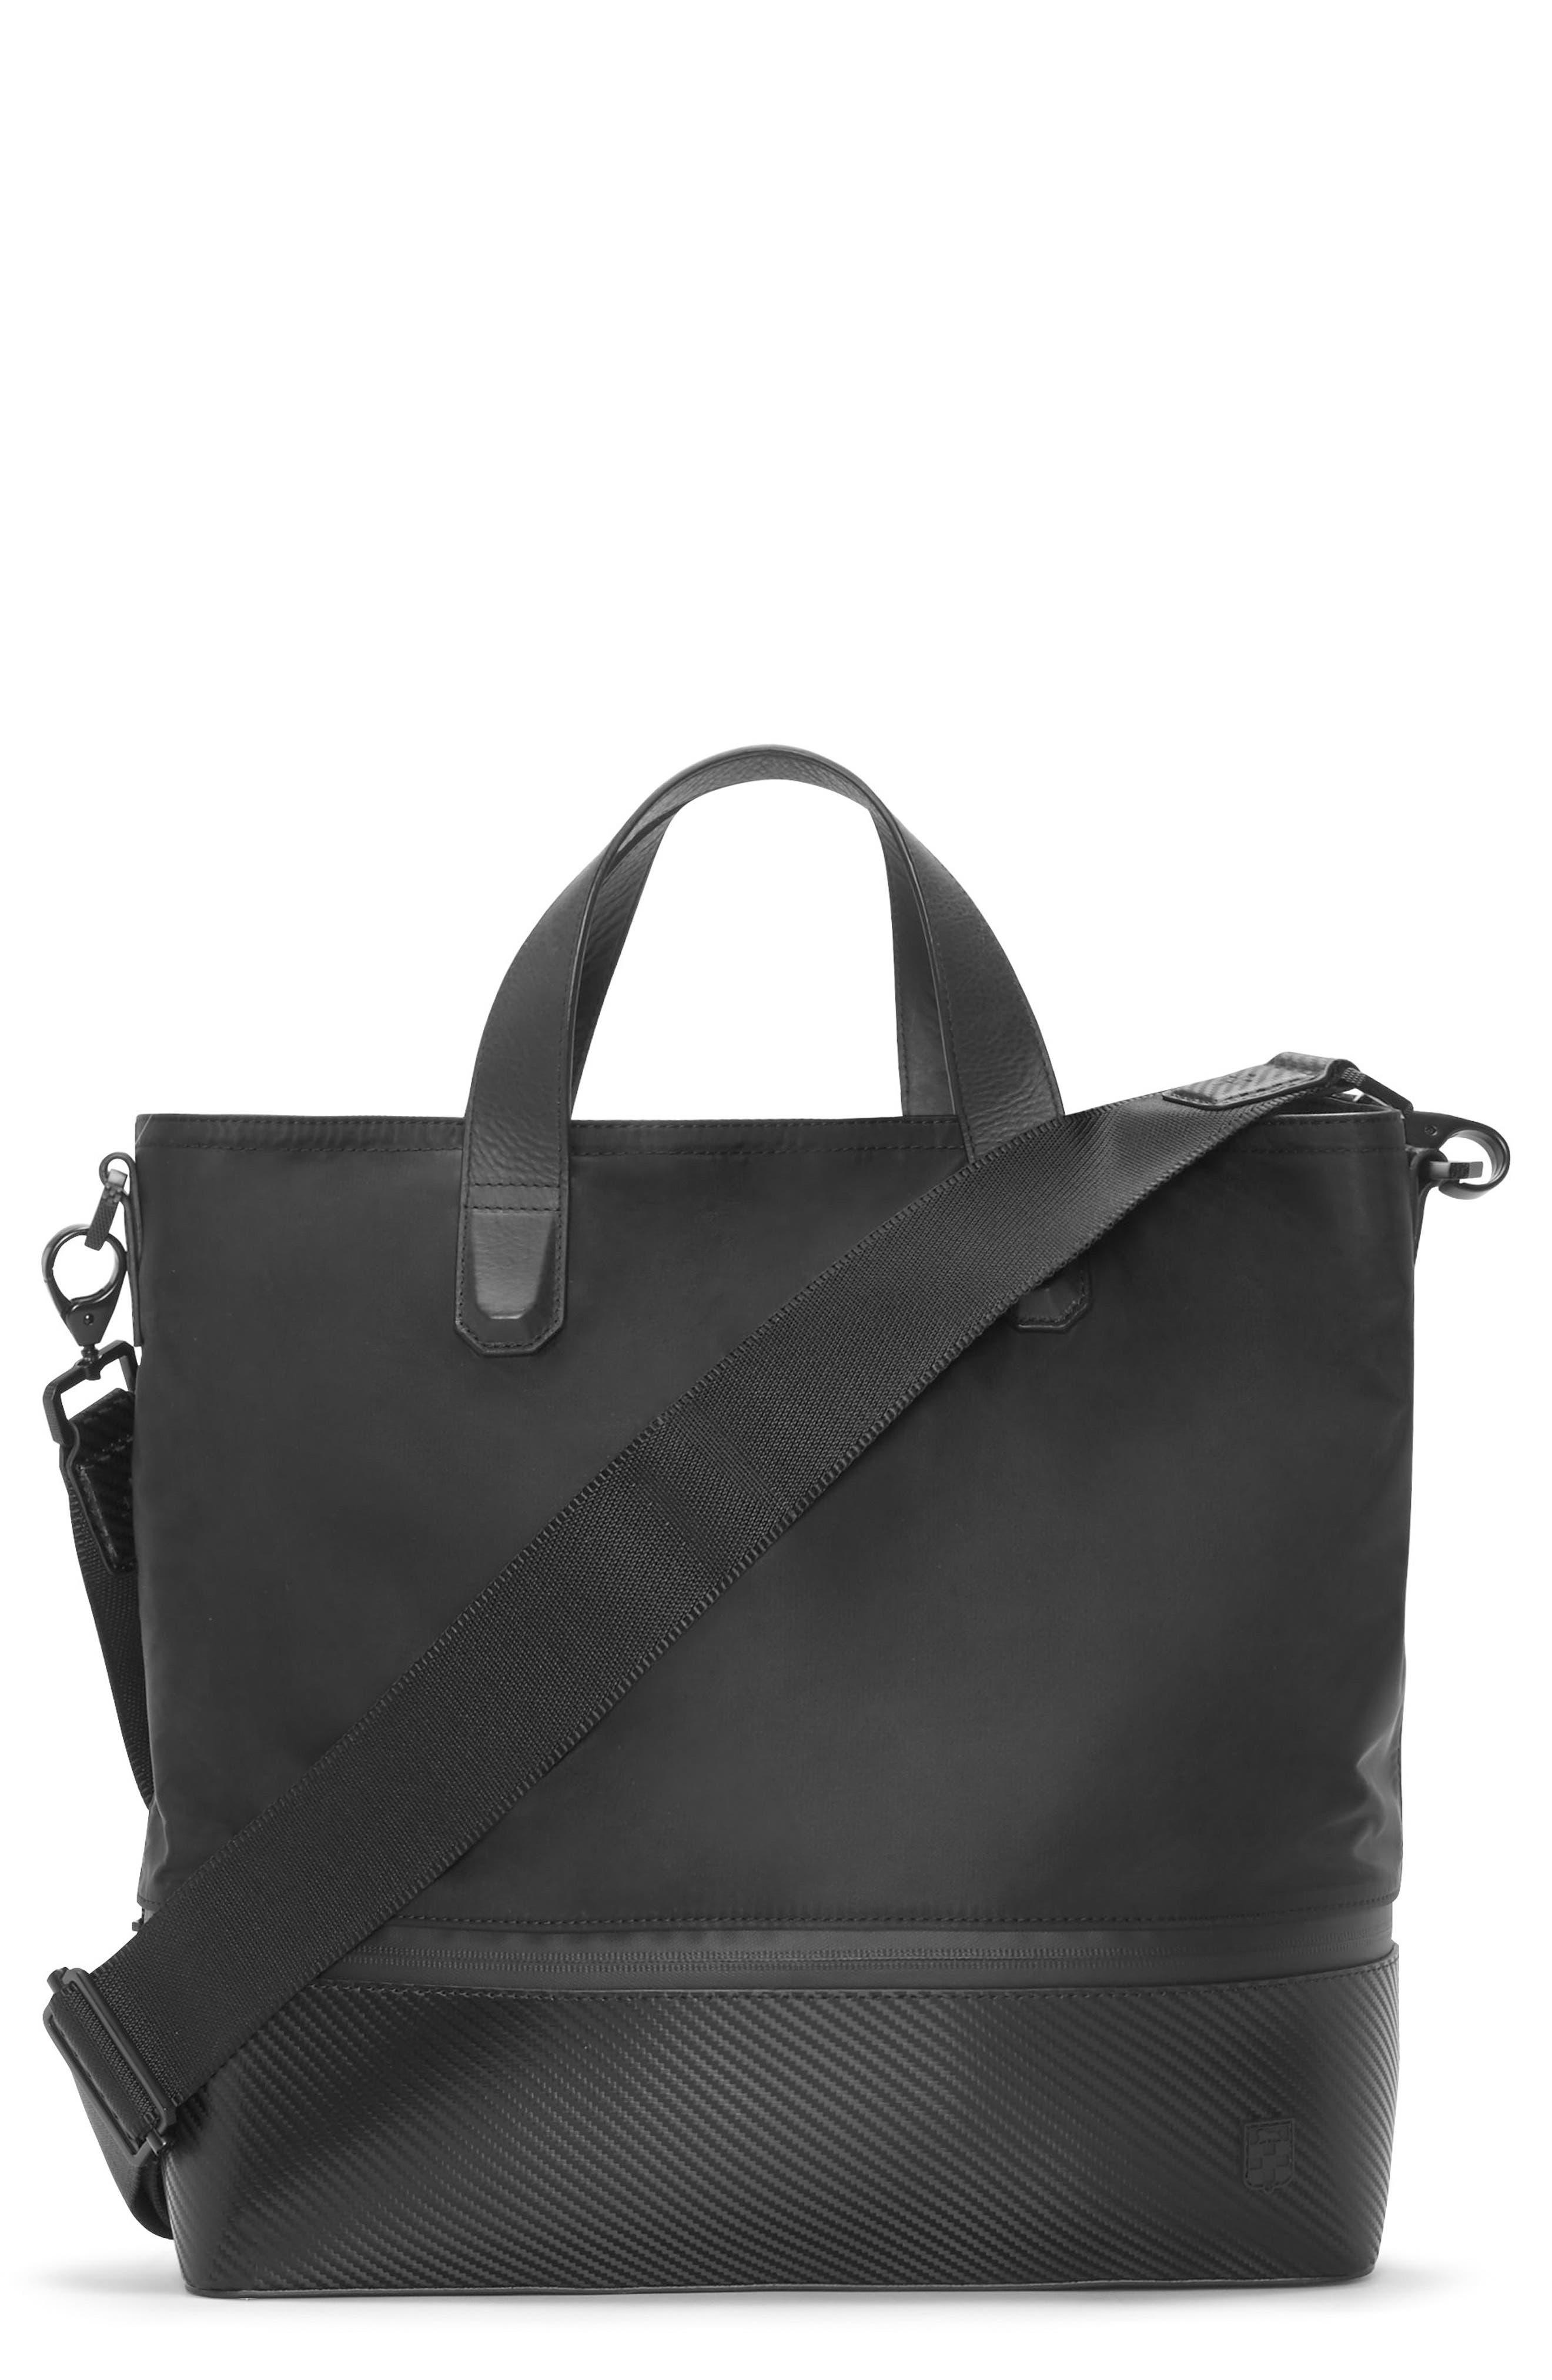 Main Image - Vince Camuto Lupe Tote Bag